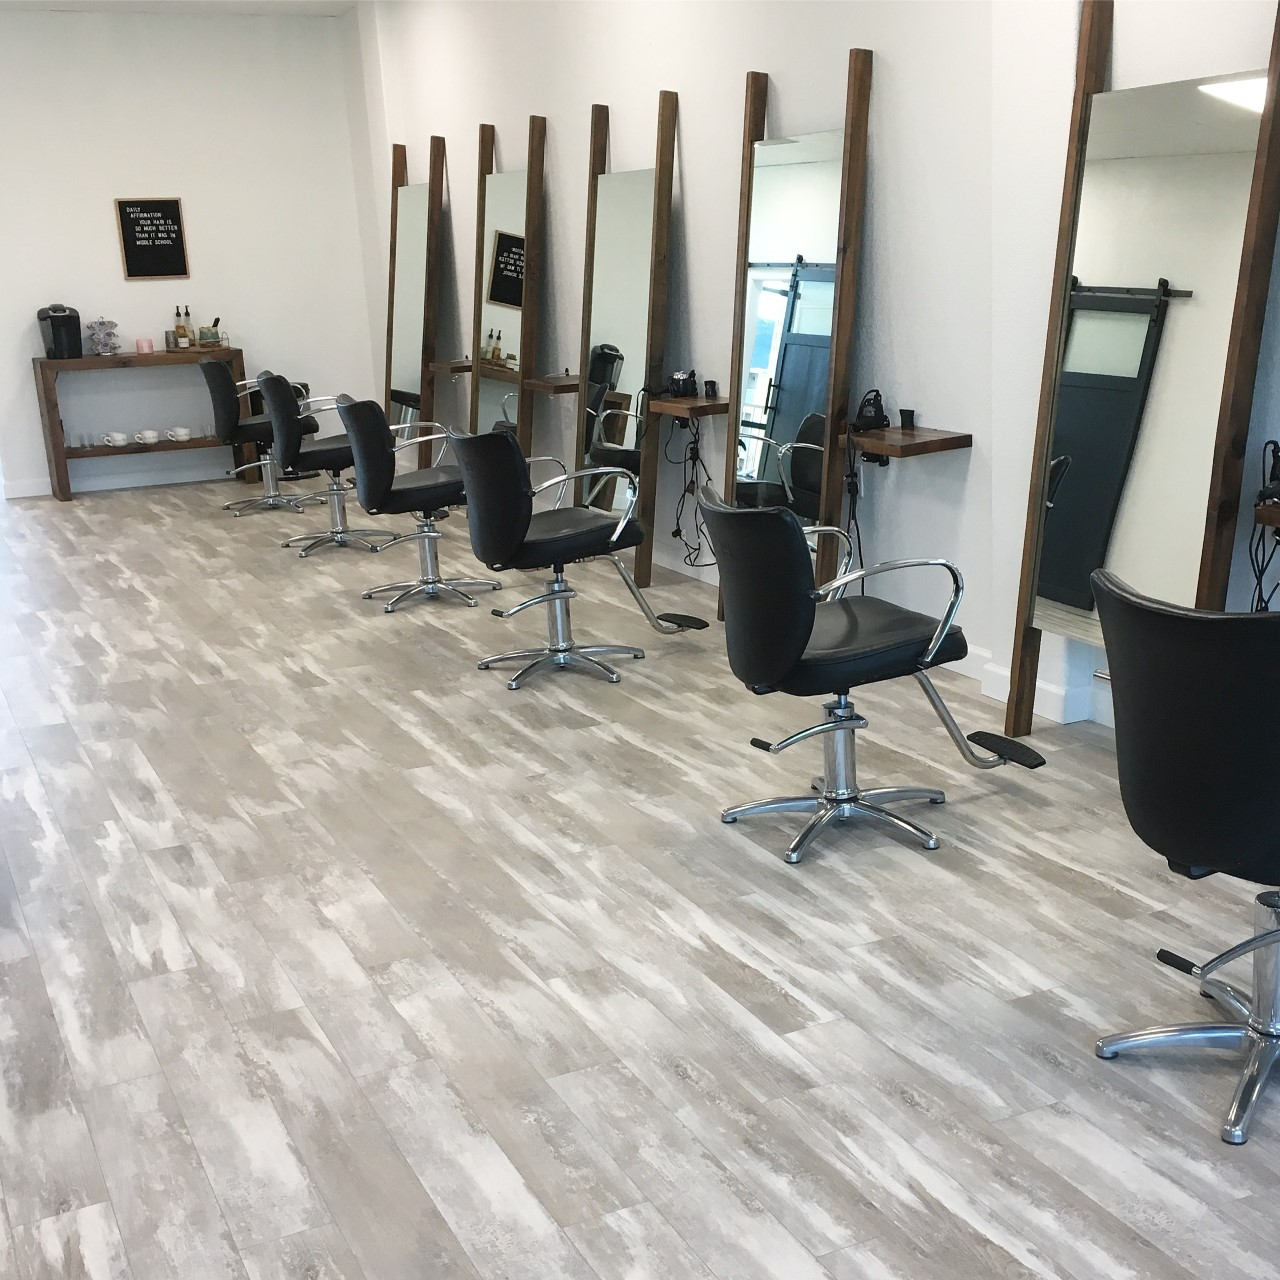 Agreable Salon Deco Springfield, MO